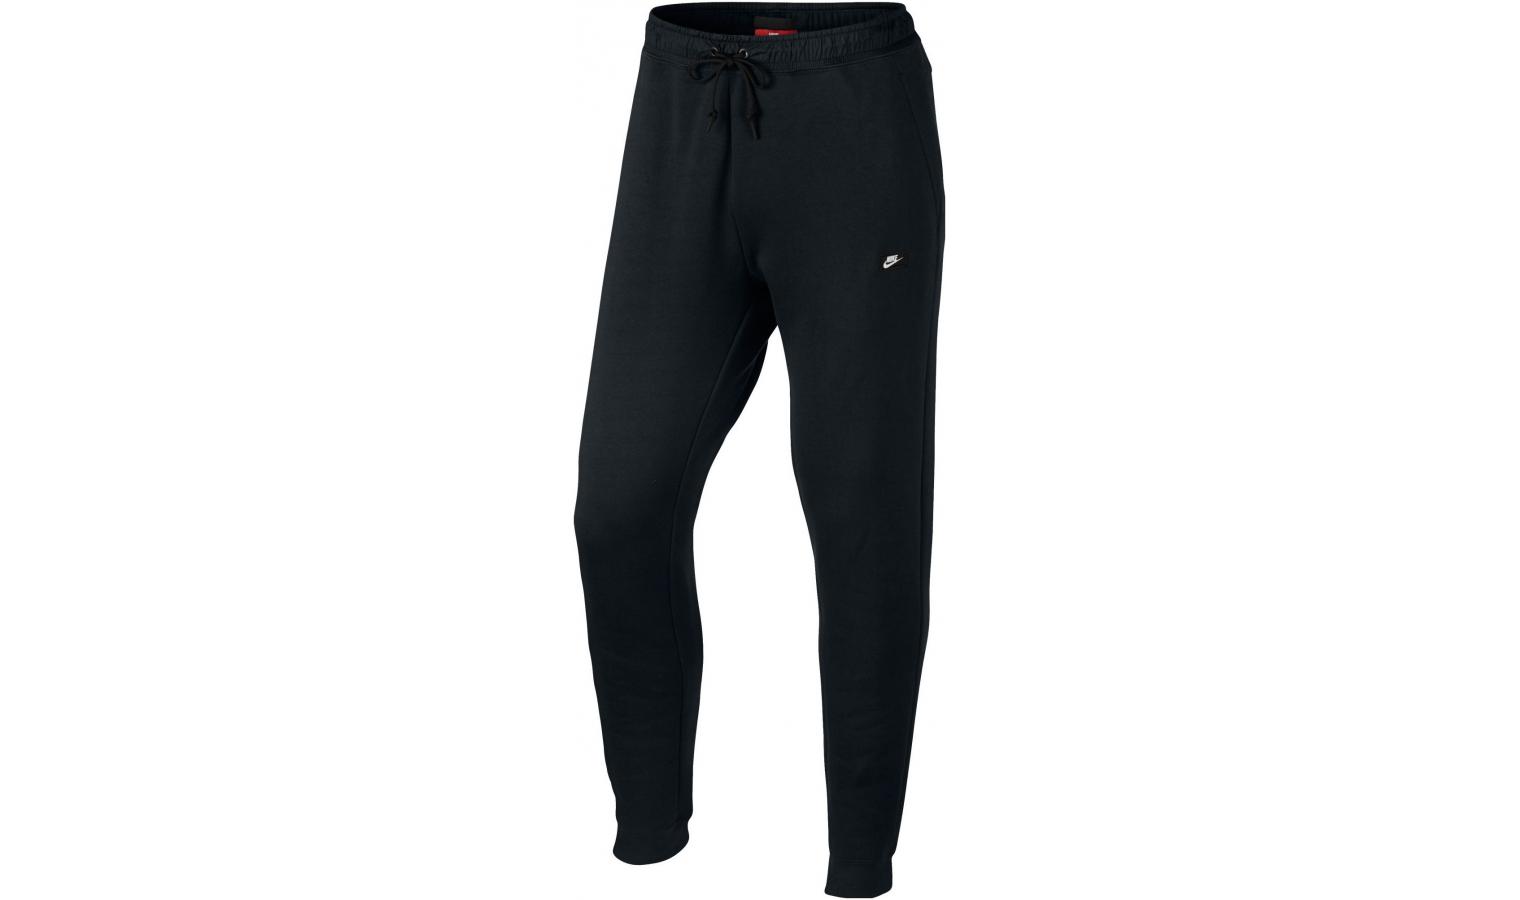 3571b2947 Pánske športové tepláky Nike MODERN JOGGER čierne | AD Sport.sk